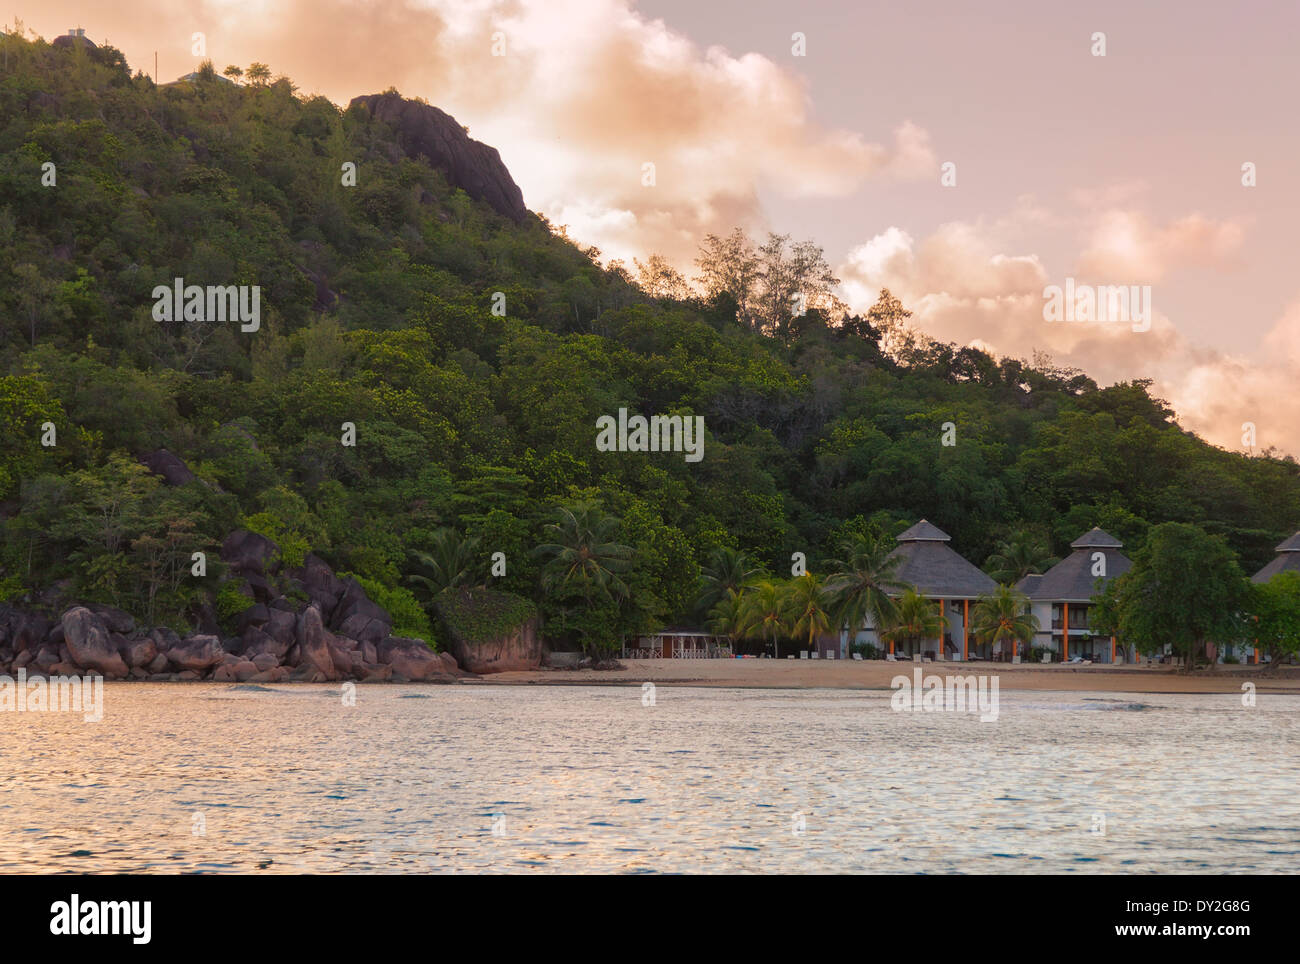 A Seychelles resort. - Stock Image